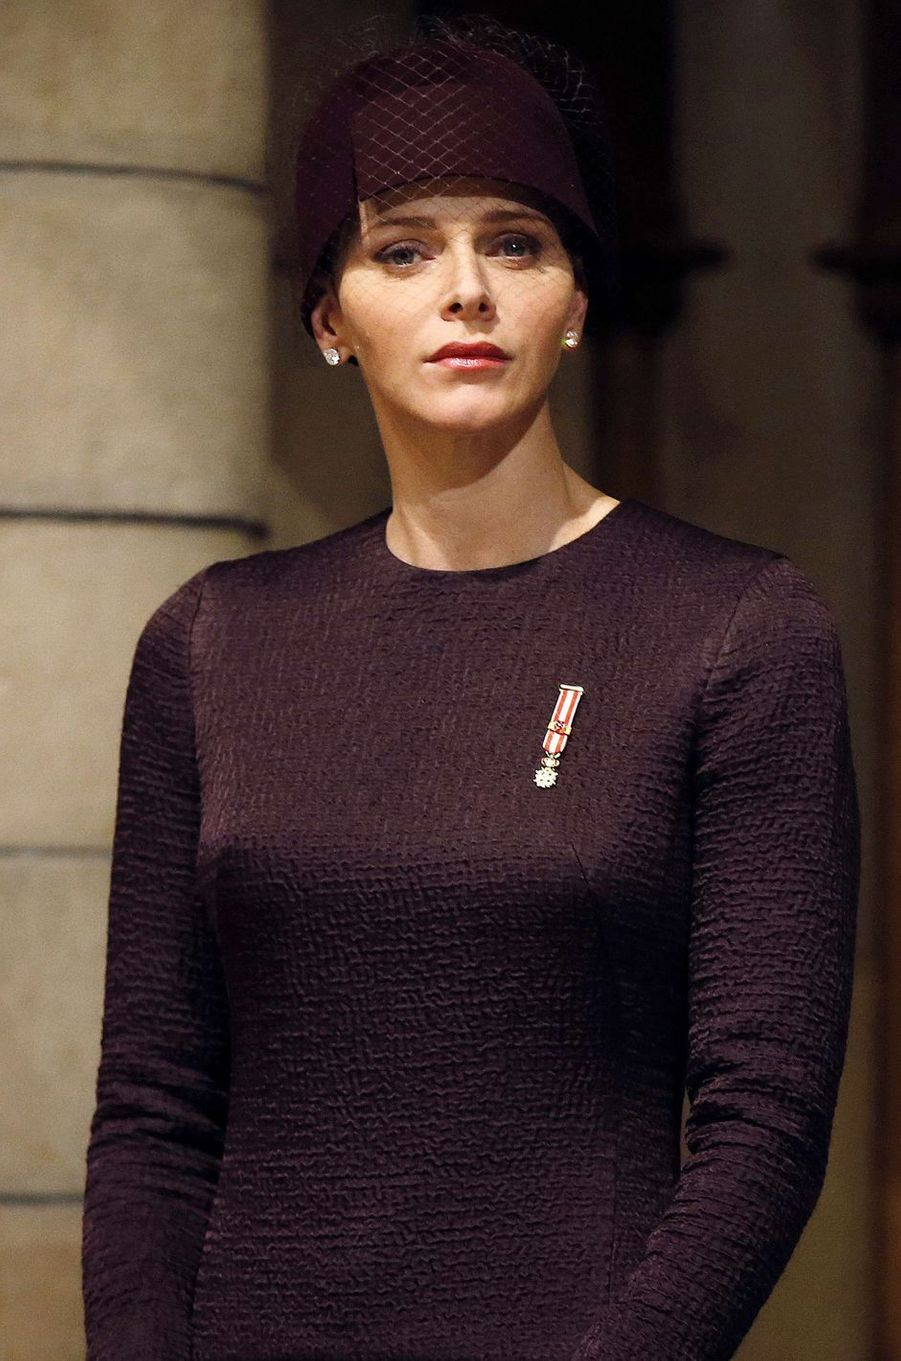 La princesse Charlène de Monaco, le 19 novembre 2015